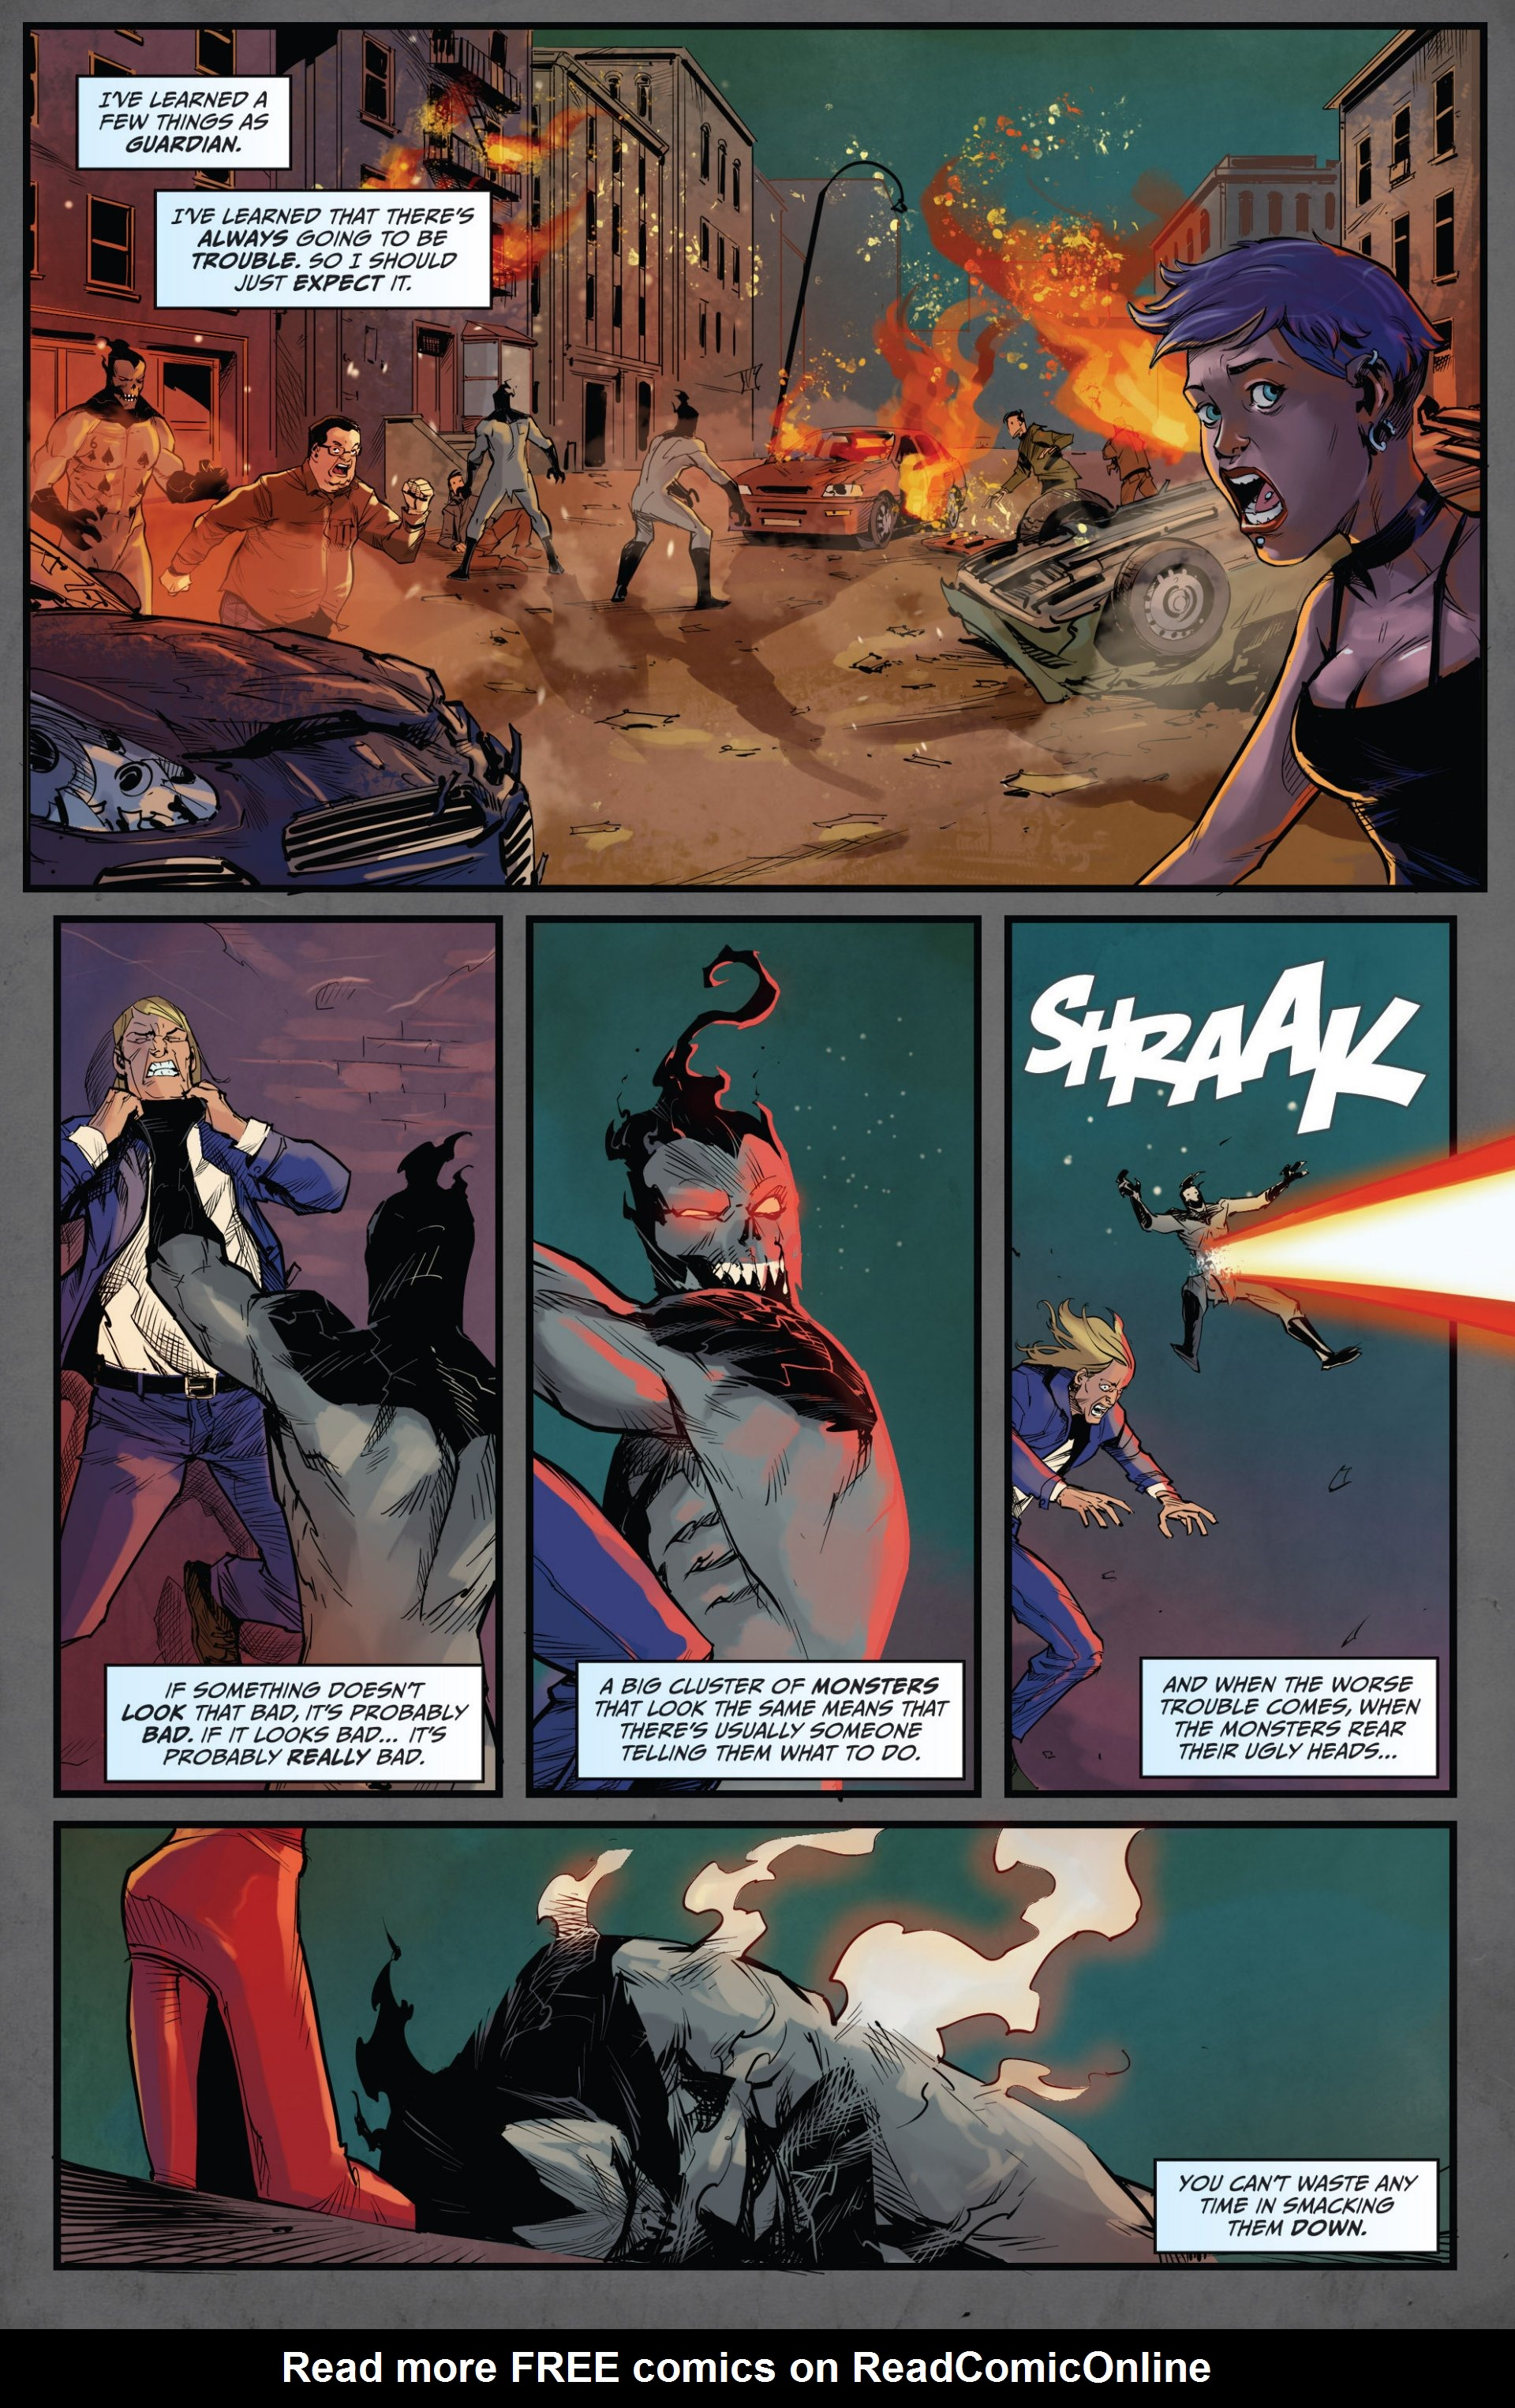 Read online Grimm Fairy Tales vs. Wonderland comic -  Issue #1 - 17